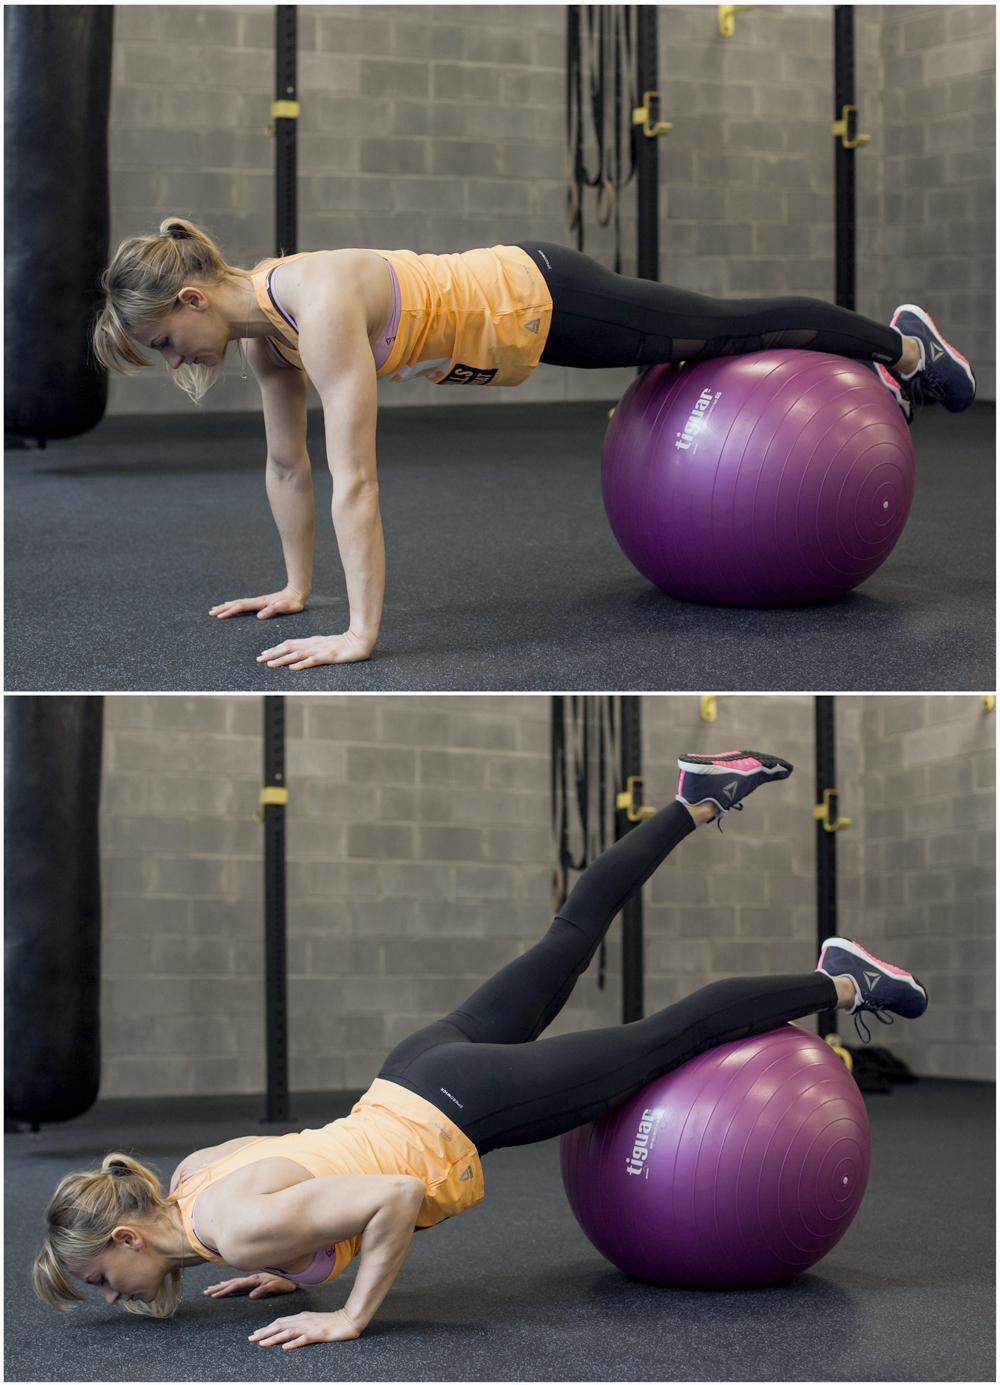 cwiczenia na core